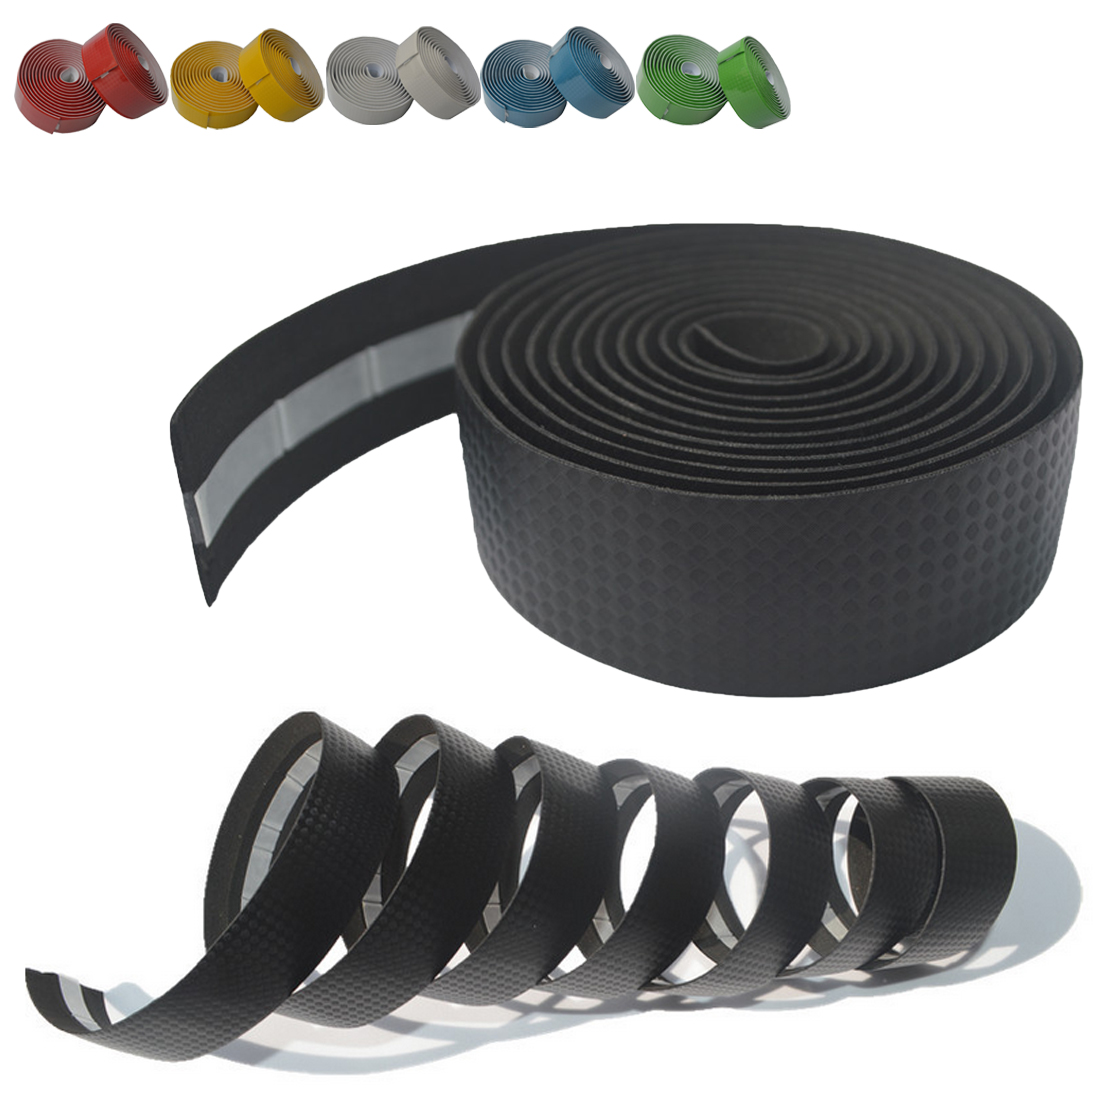 1 Pair Road Bike Anti-slip Handlebar Tape Cork Bicycle Carbon Handle Belt Wrap+2 Bar Plug Bicycle Parts Bike Accessories